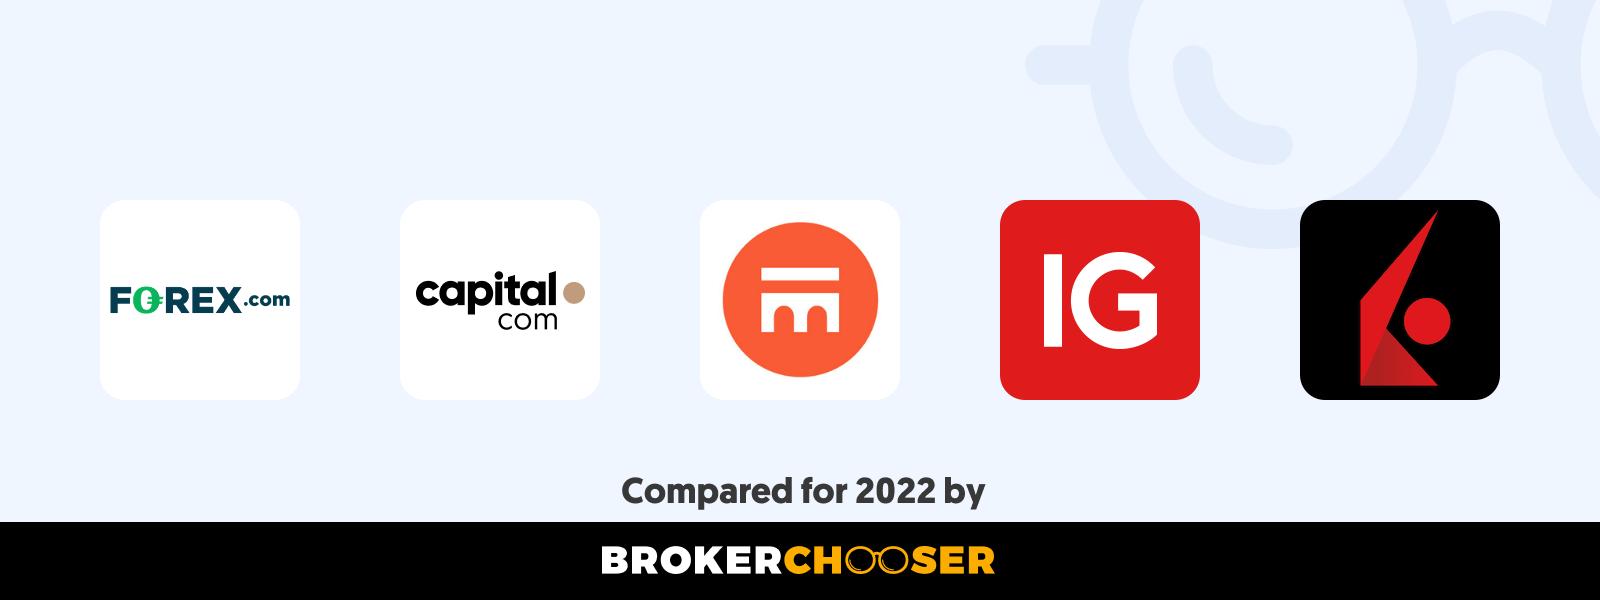 Best forex brokers for beginners in the Cook Islands in 2021